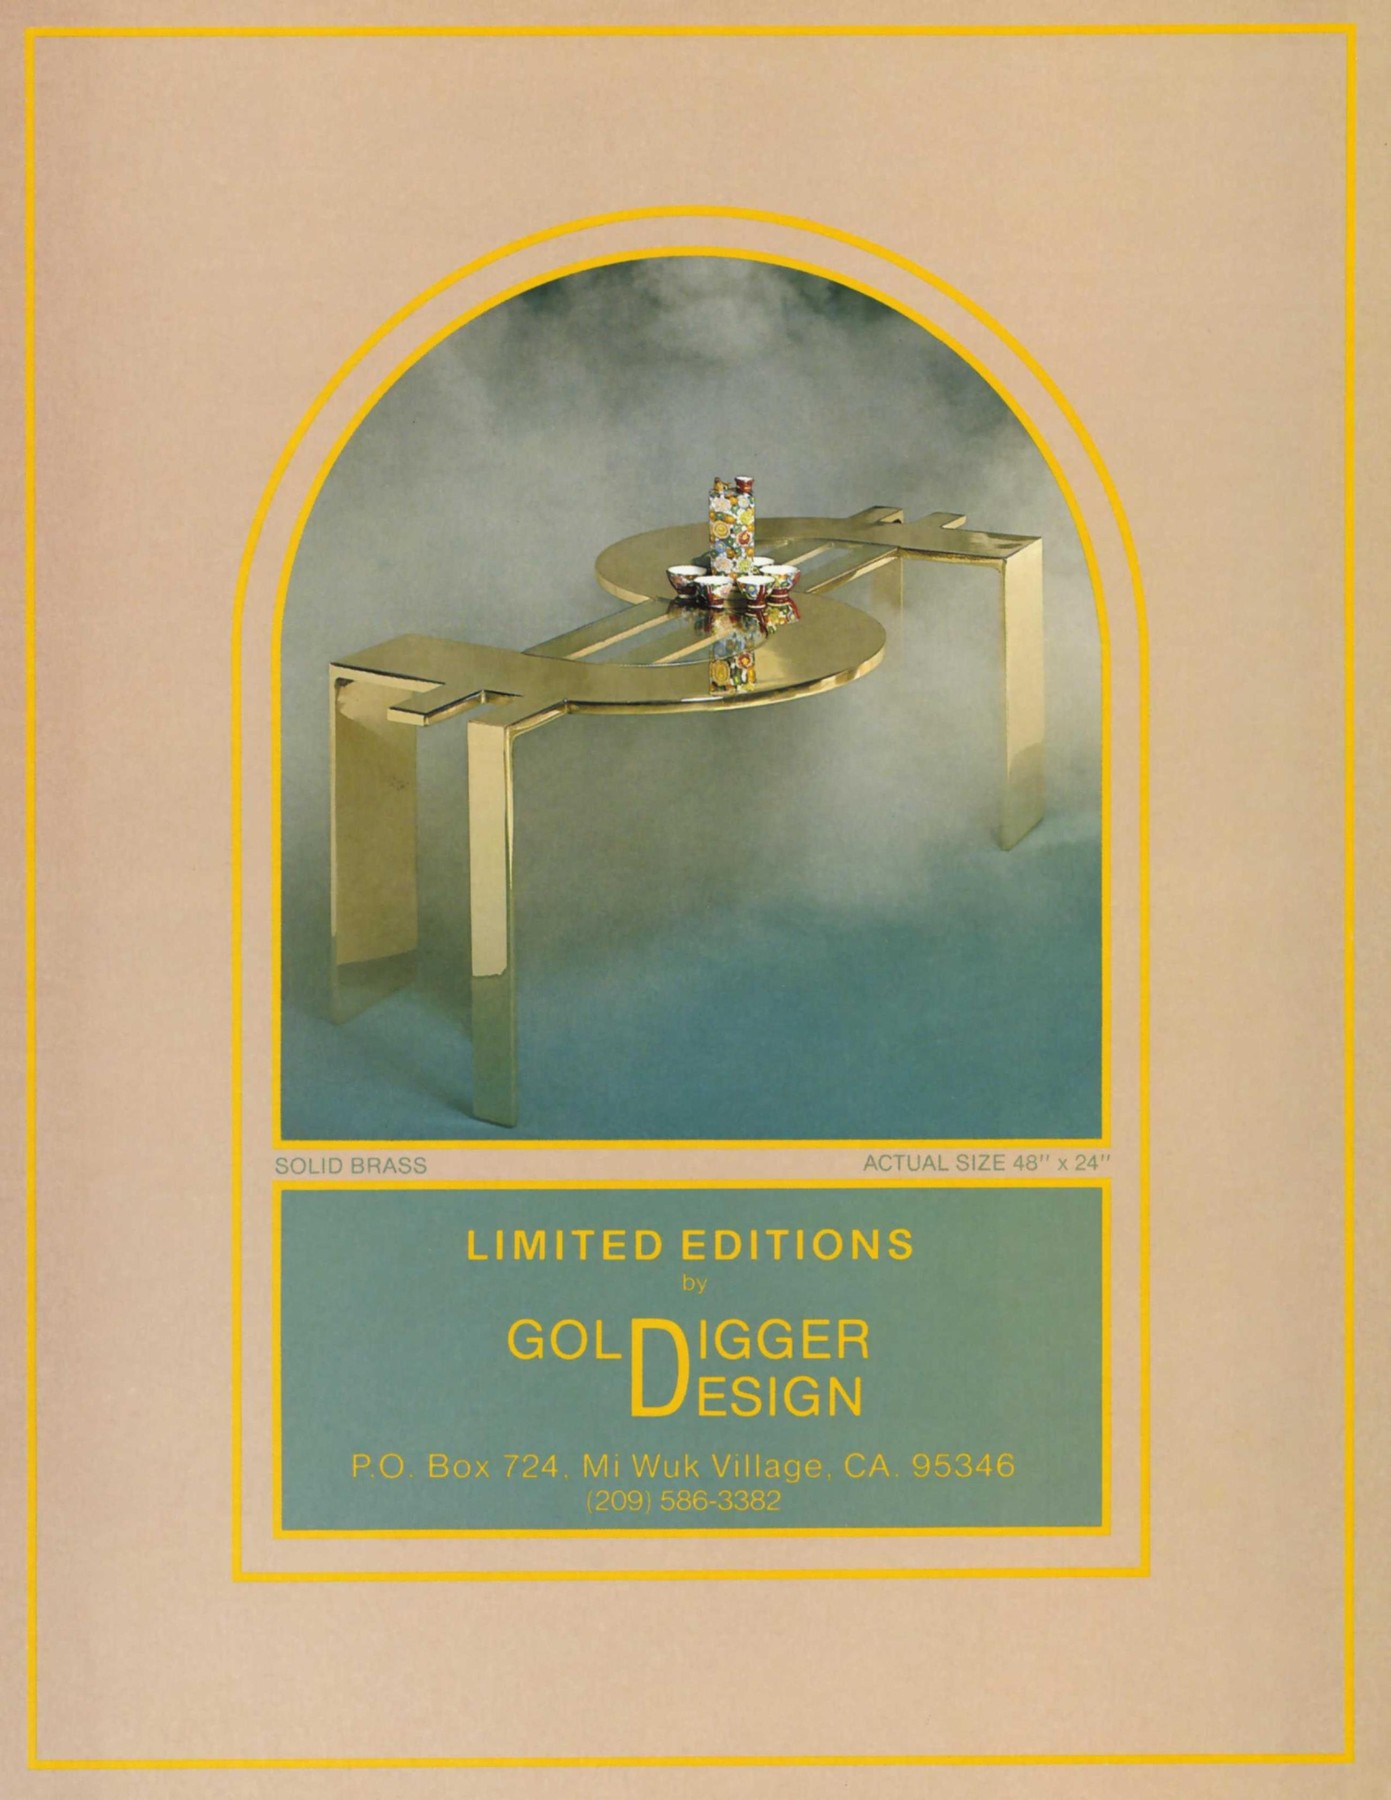 Goldigger Design ad (1983)